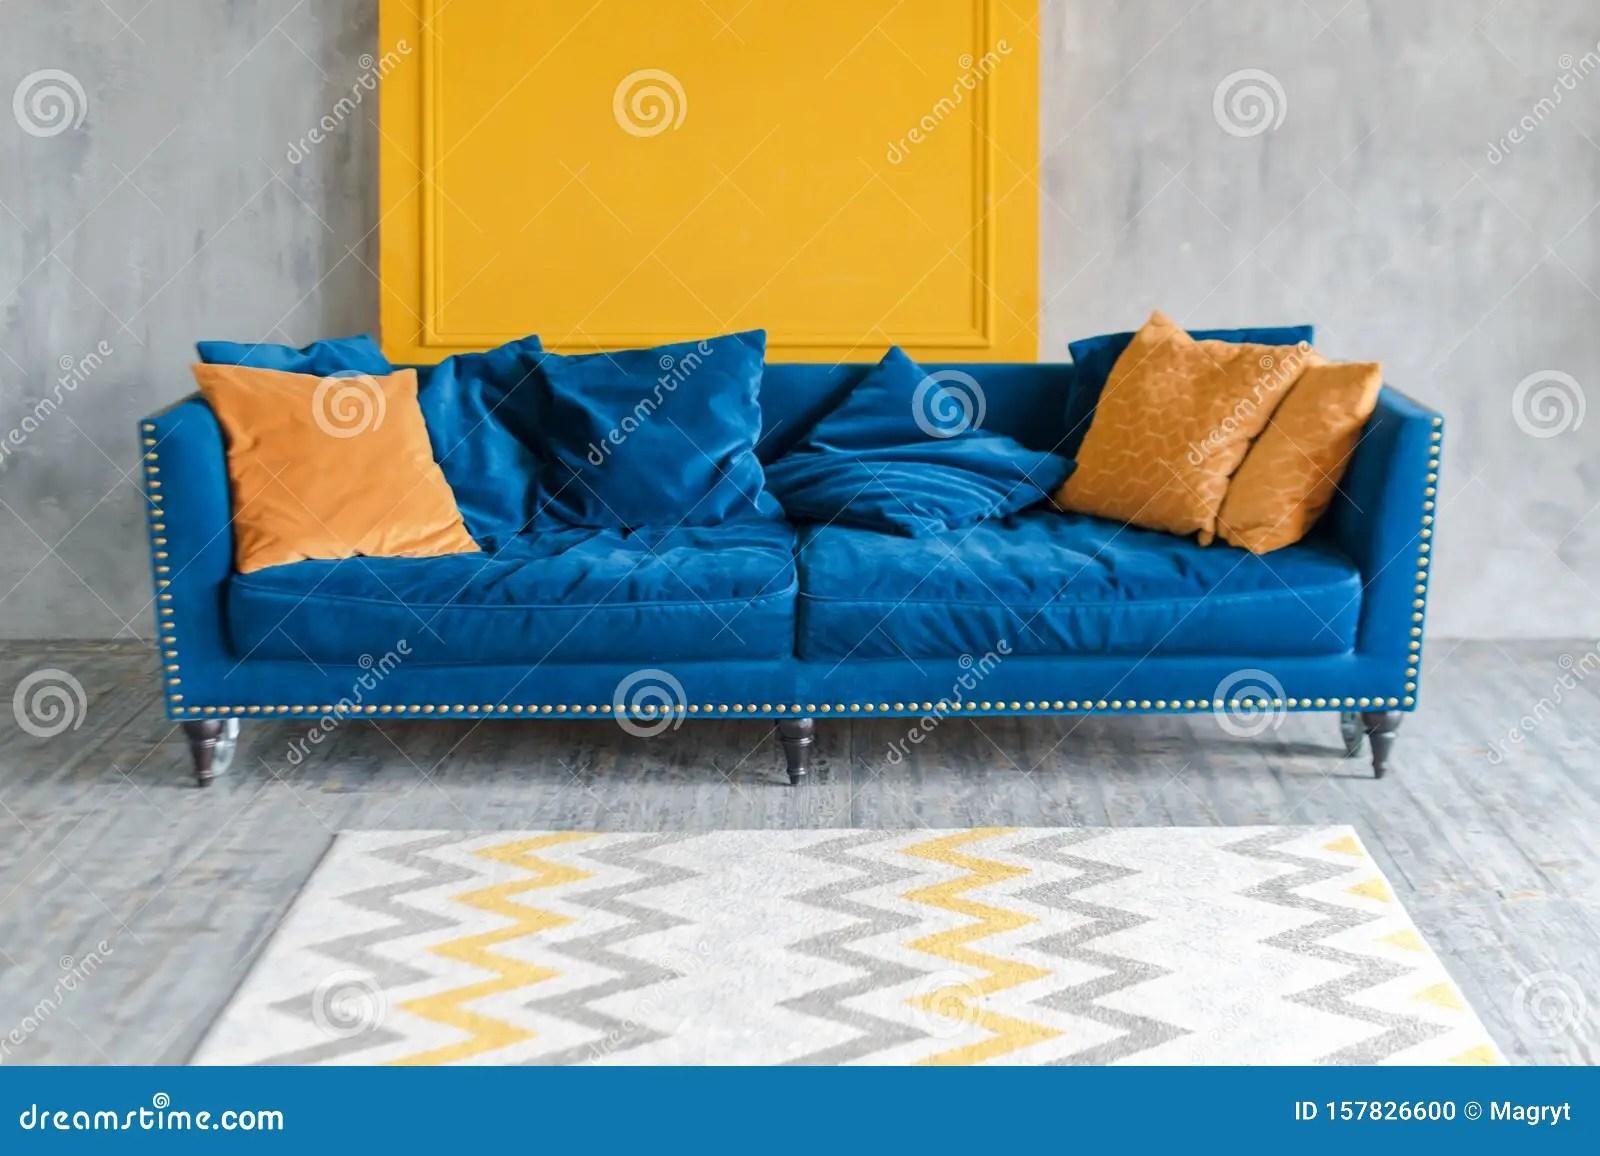 https www dreamstime com comfortable classic blue couch orange pillows simple minimalist apartment comfortable classic blue couch orange image157826600